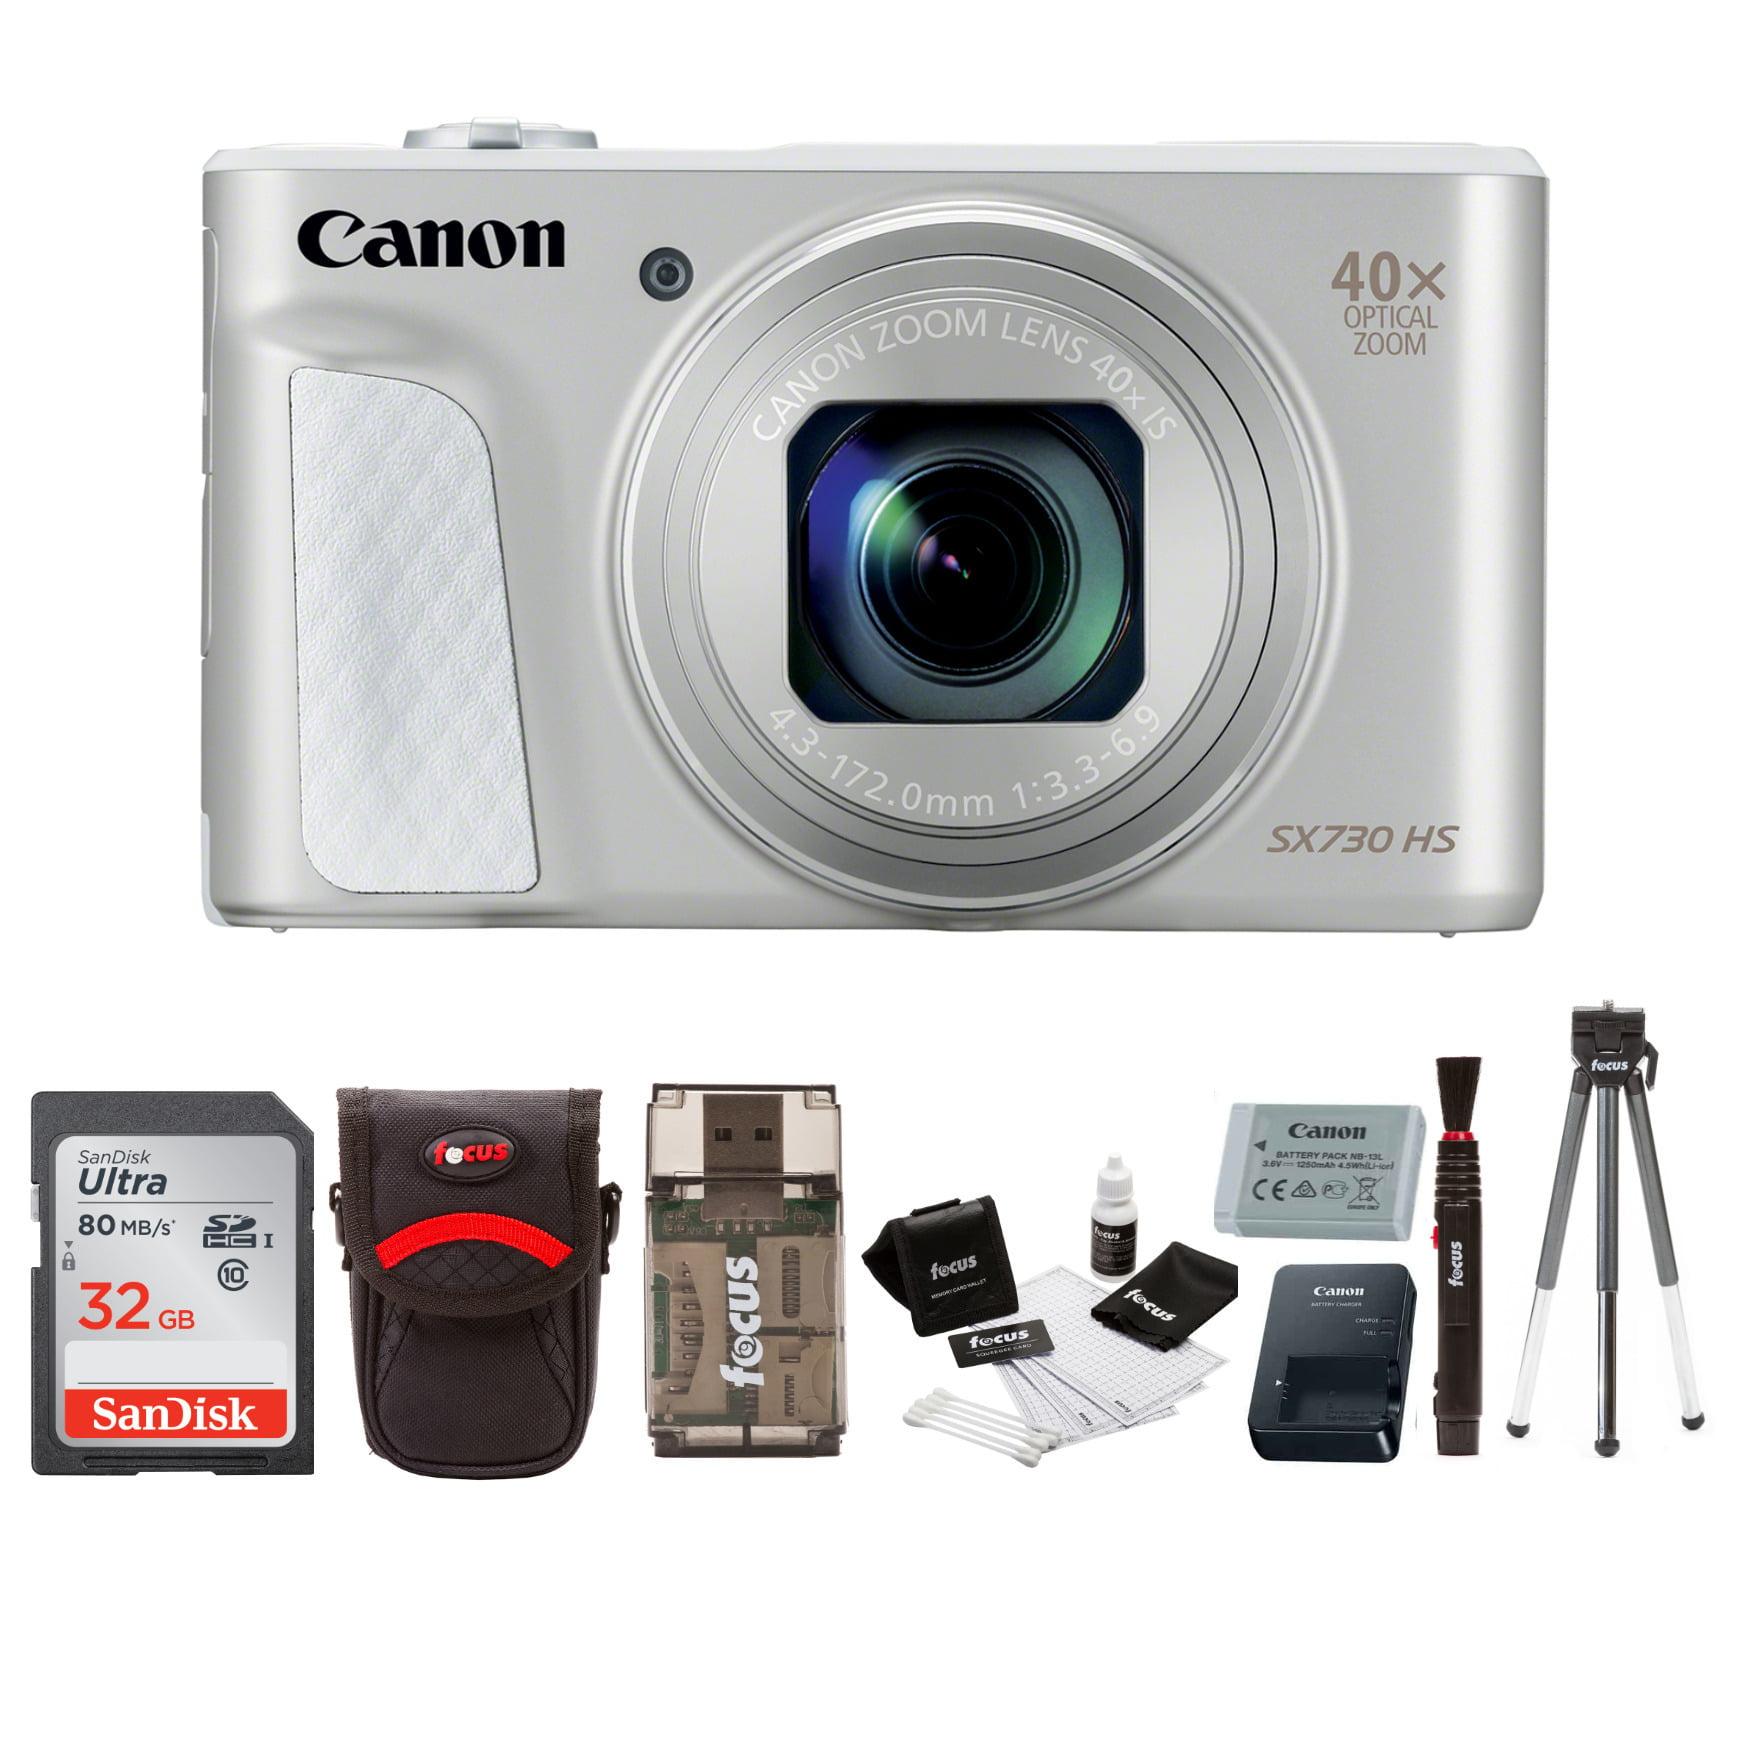 Canon Powershot SX730 Digital Camera (Silver) with 32GB Card Accessory Bundle